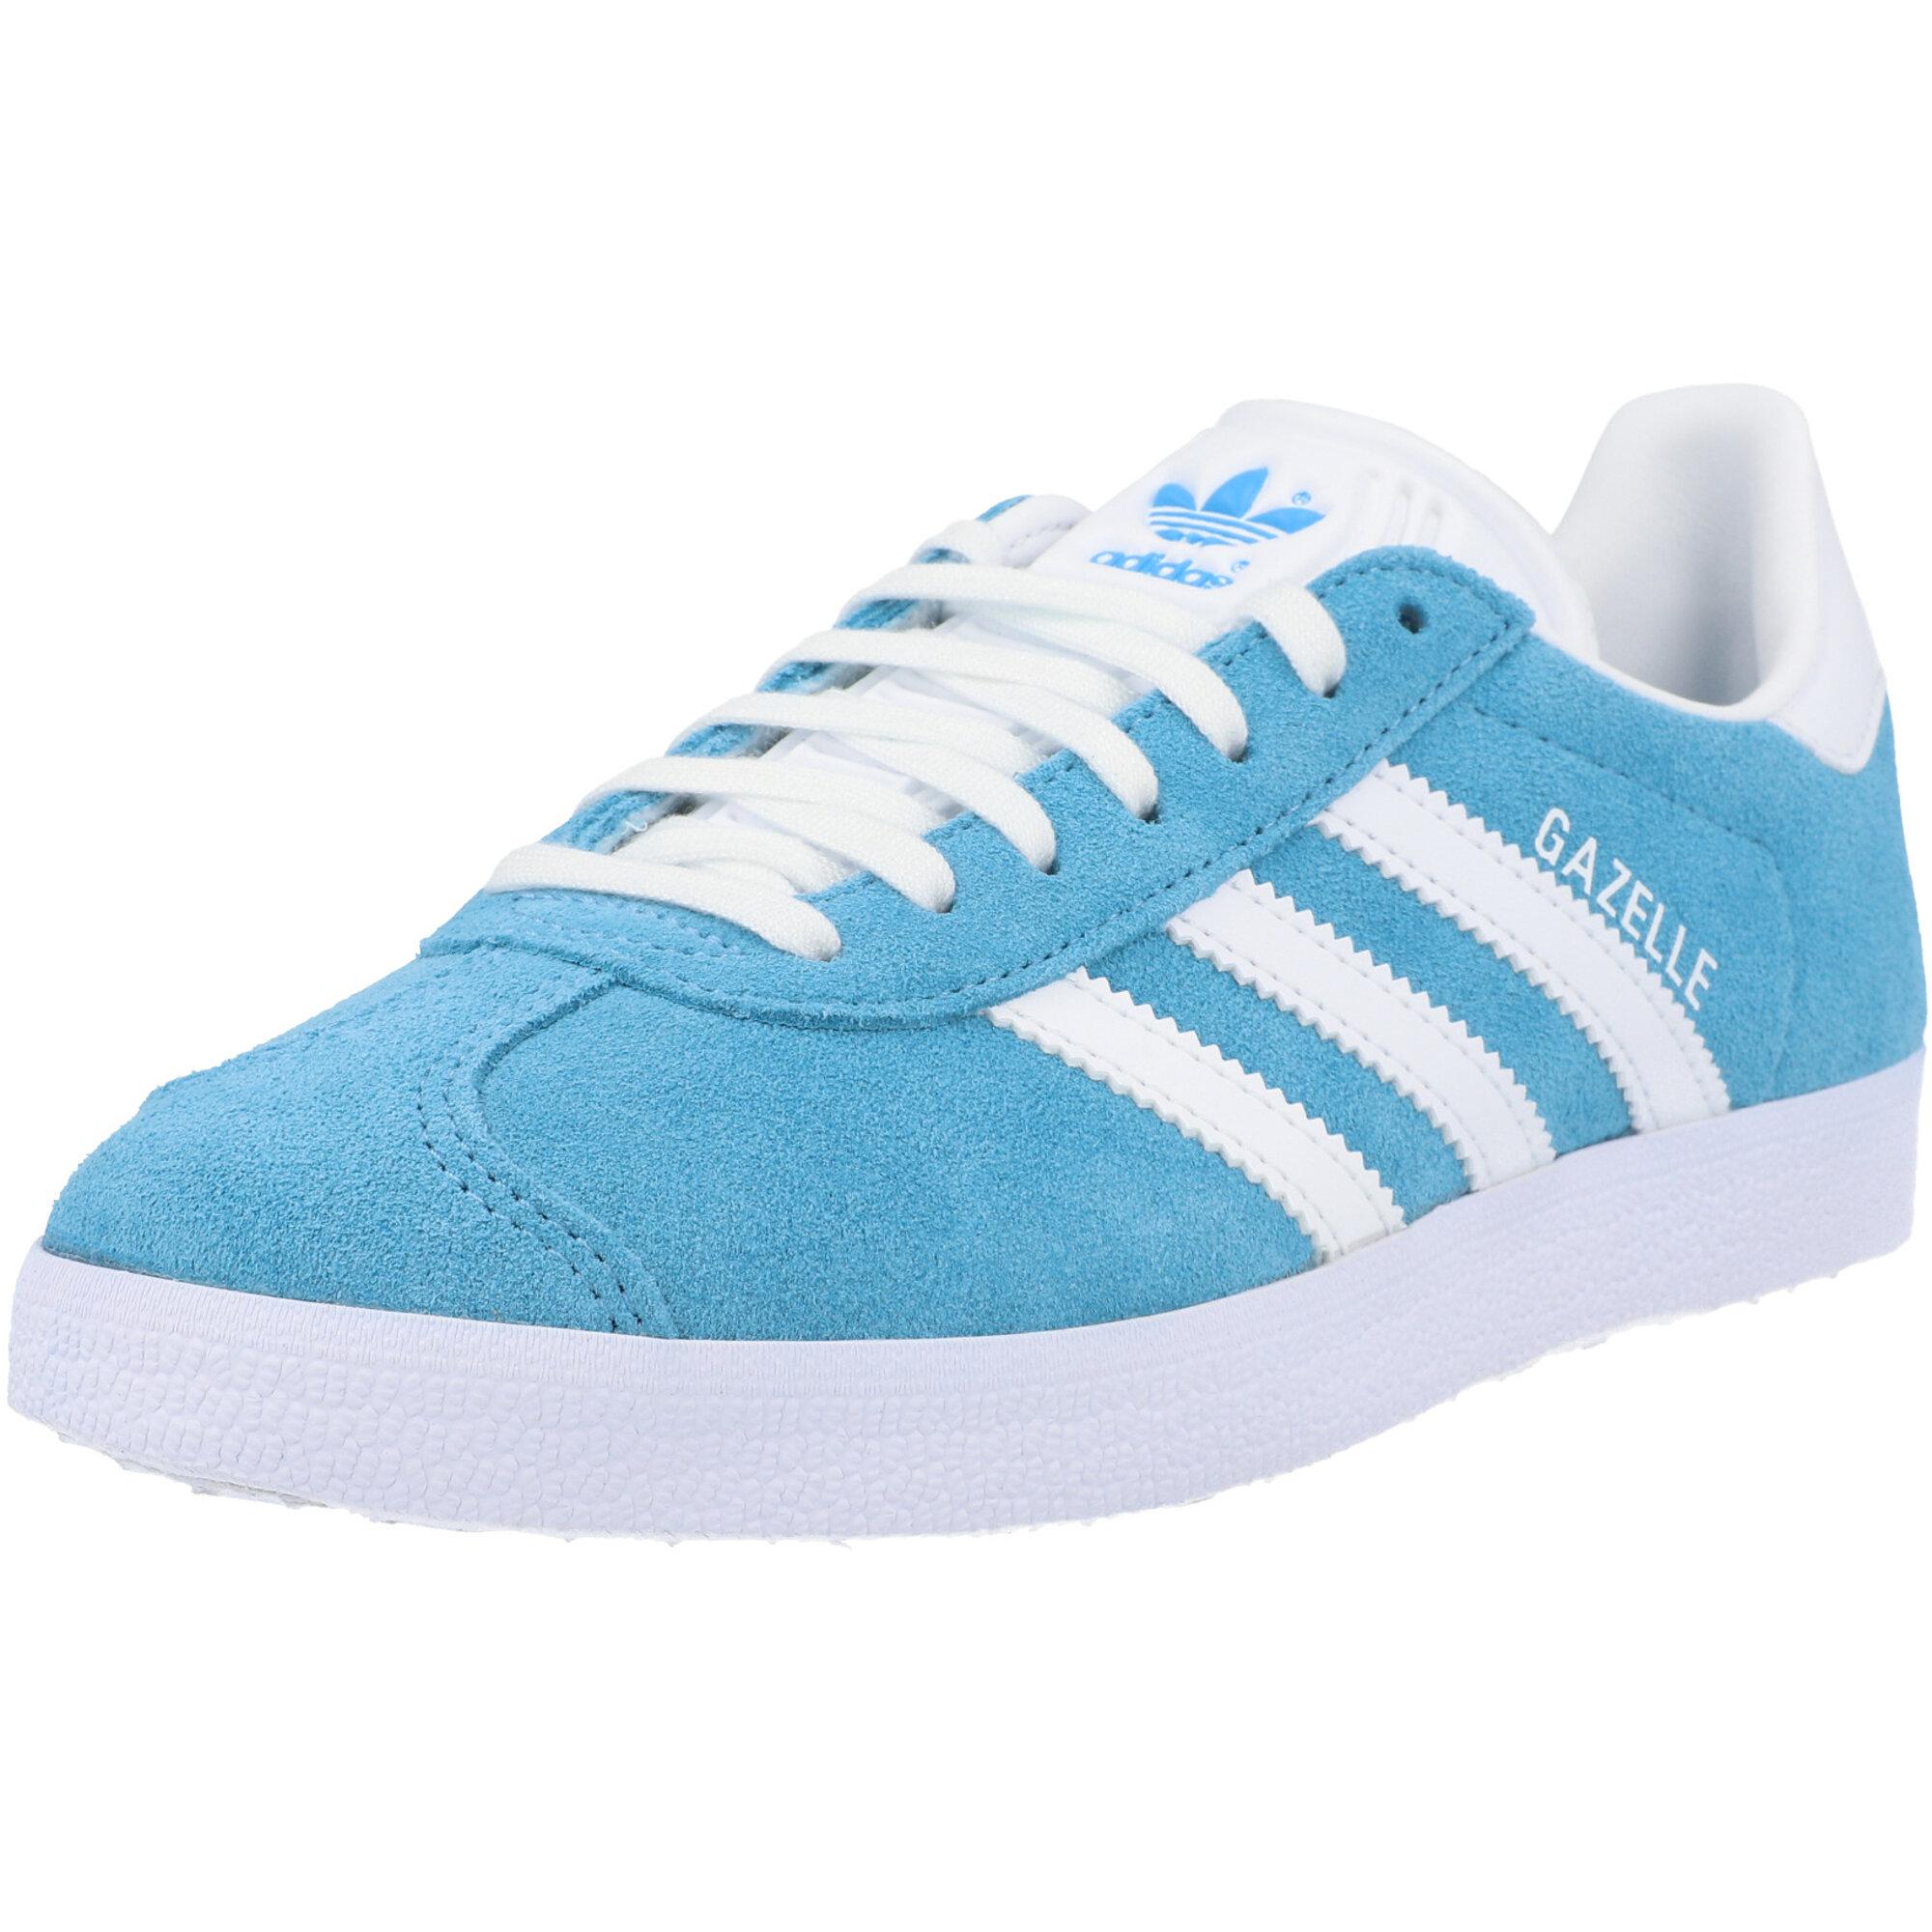 adidas Originals Gazelle W Blue/White Leather Adult